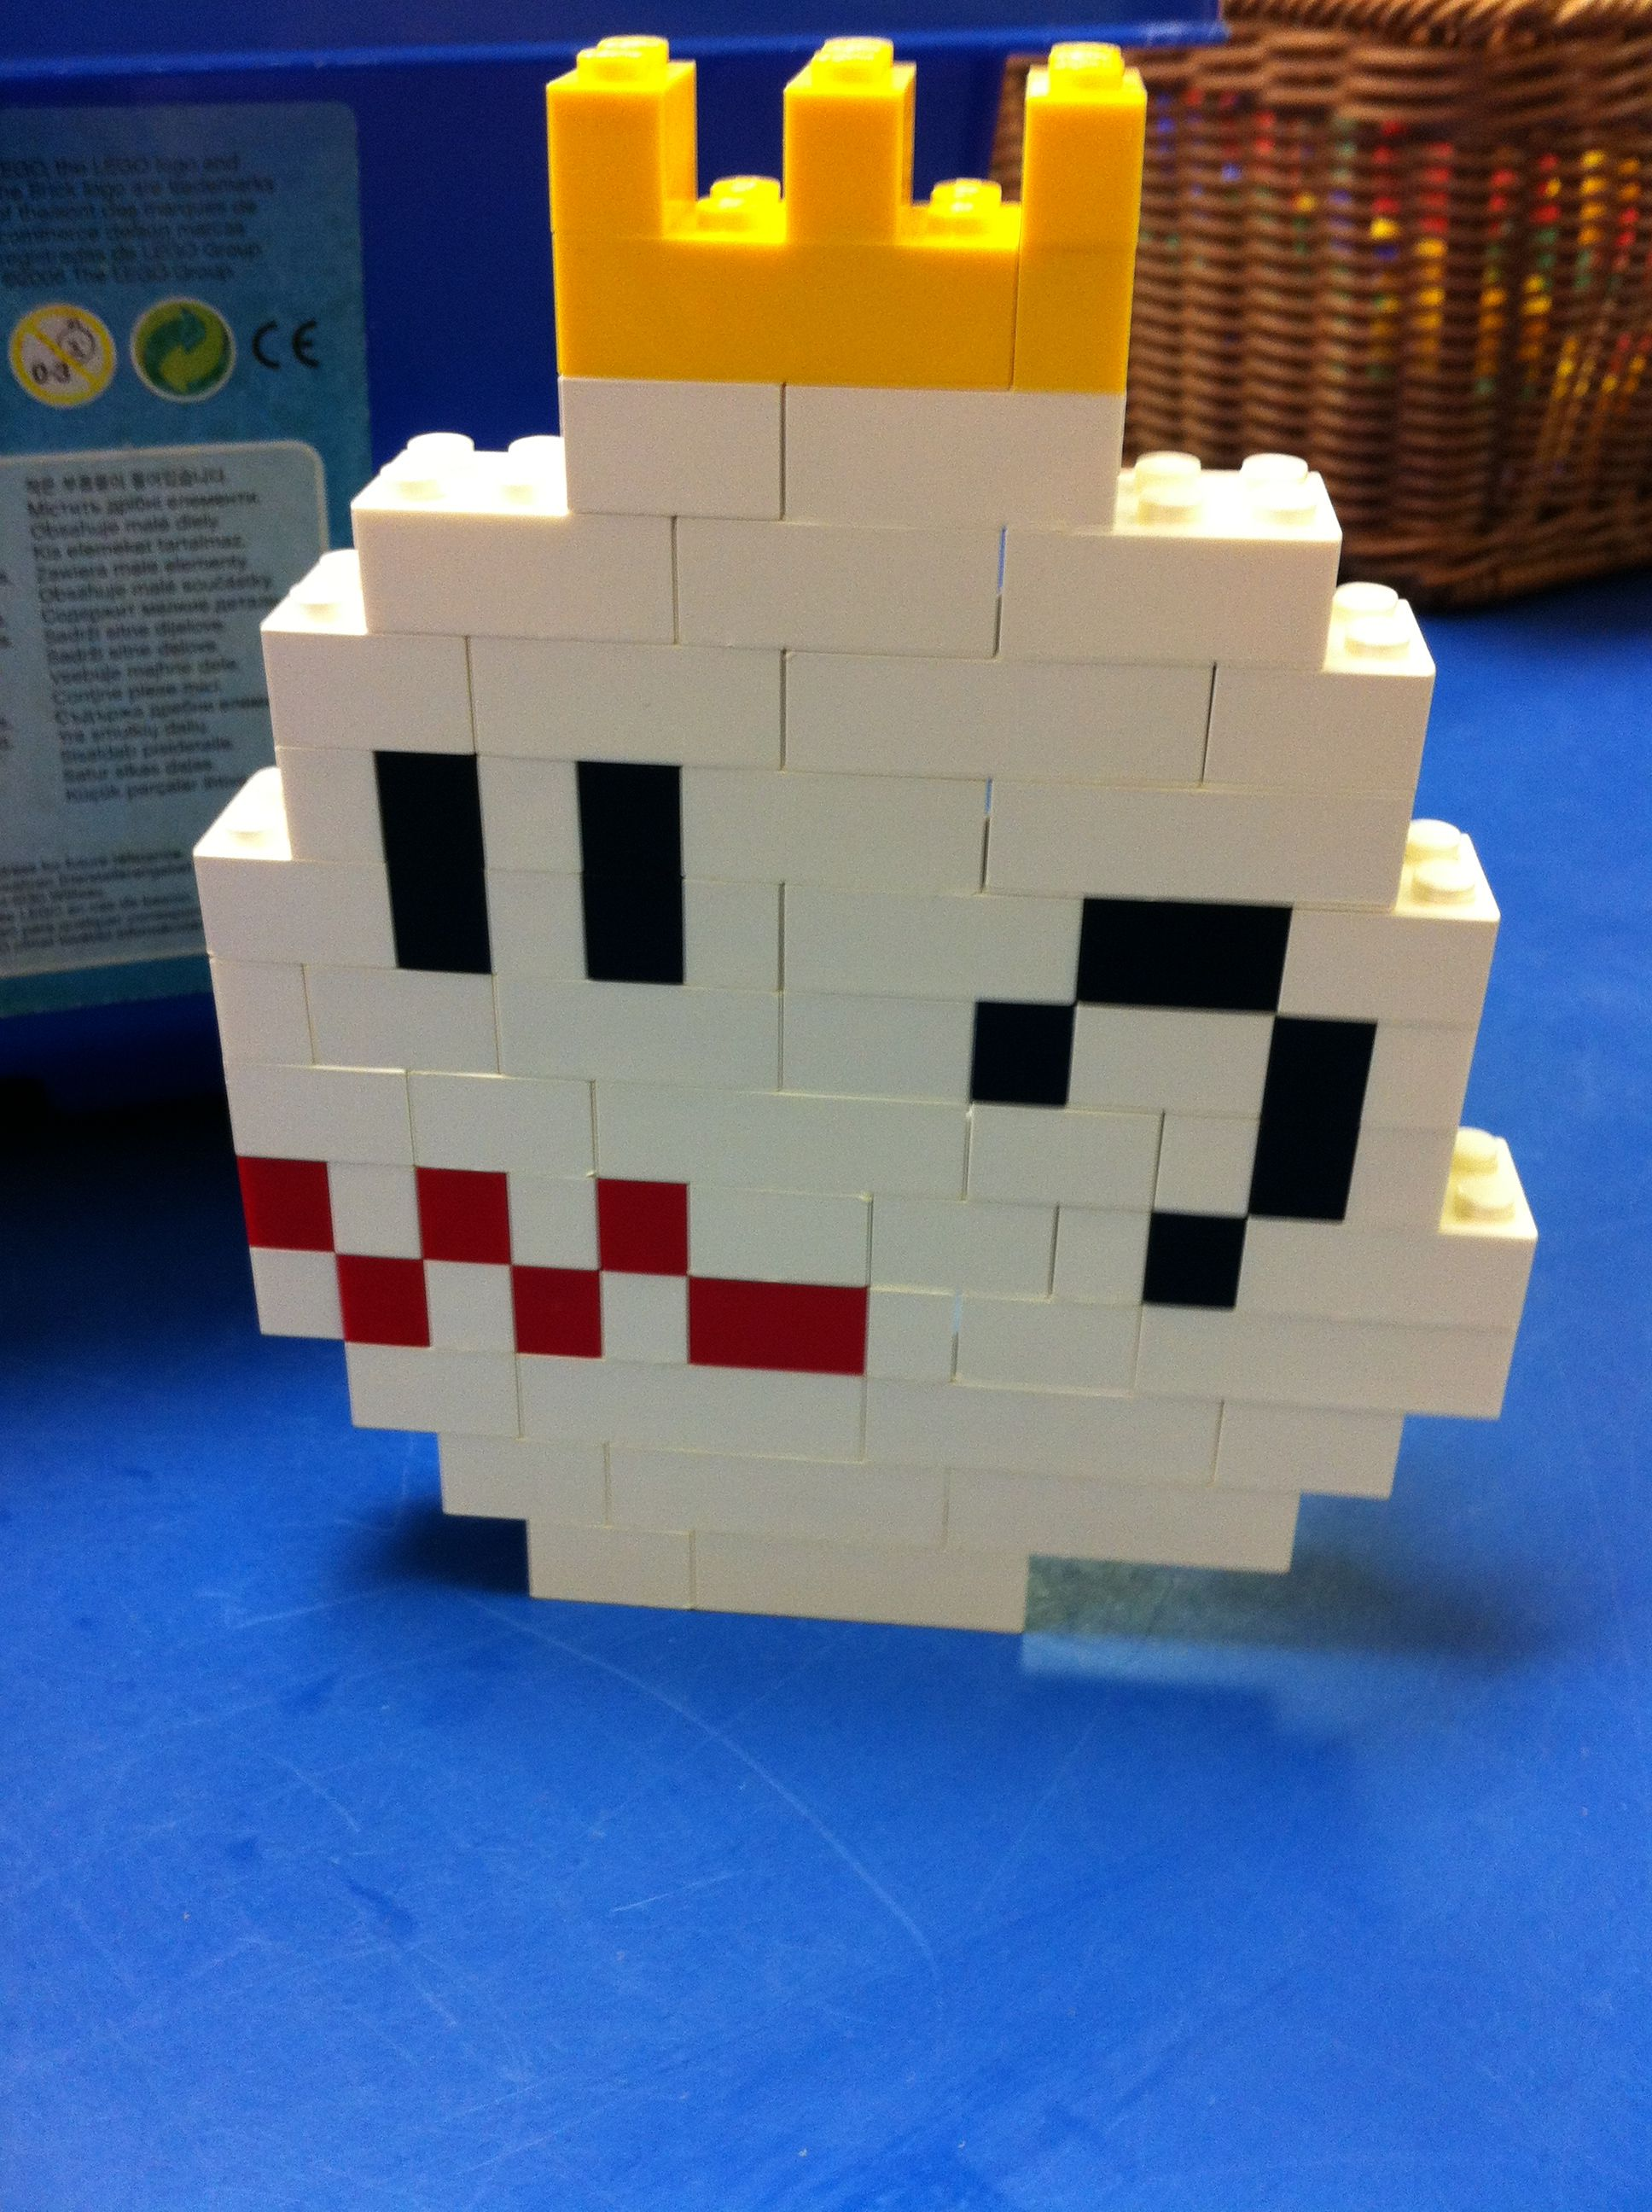 LEGO Brickfair creations (last one, I promise!)